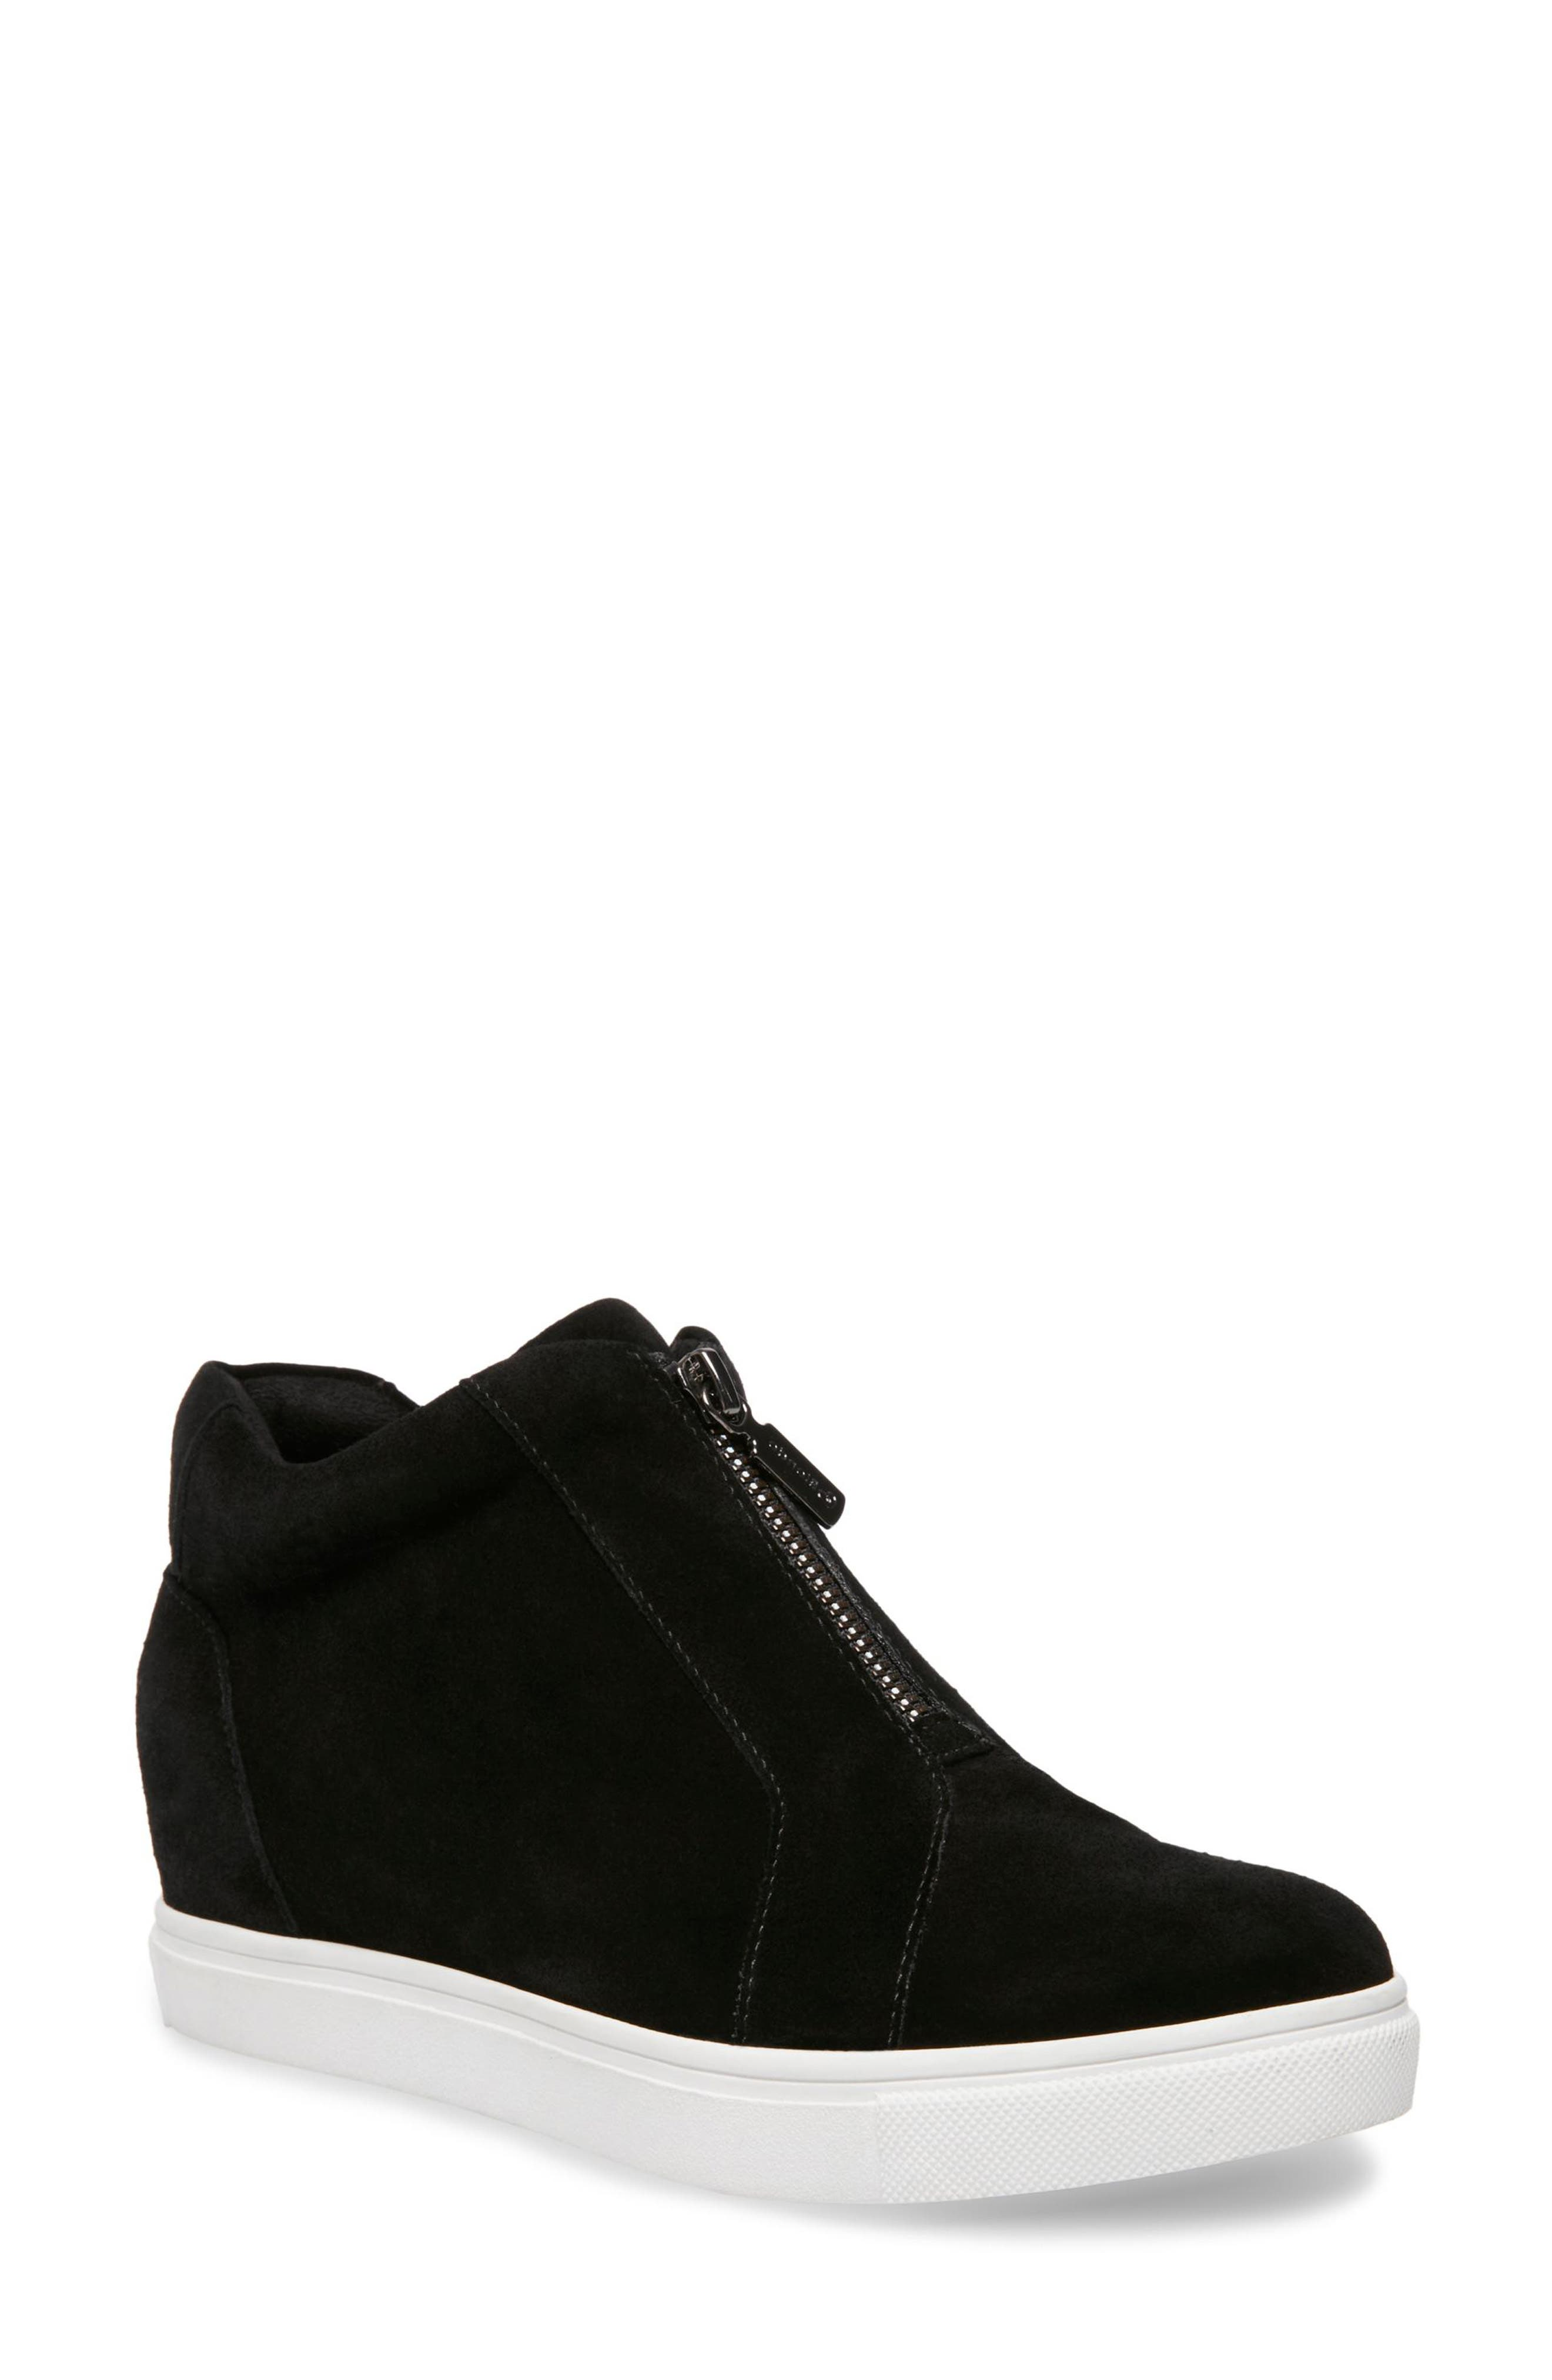 Glenda Waterproof Sneaker Bootie,                             Main thumbnail 1, color,                             BLACK SUEDE